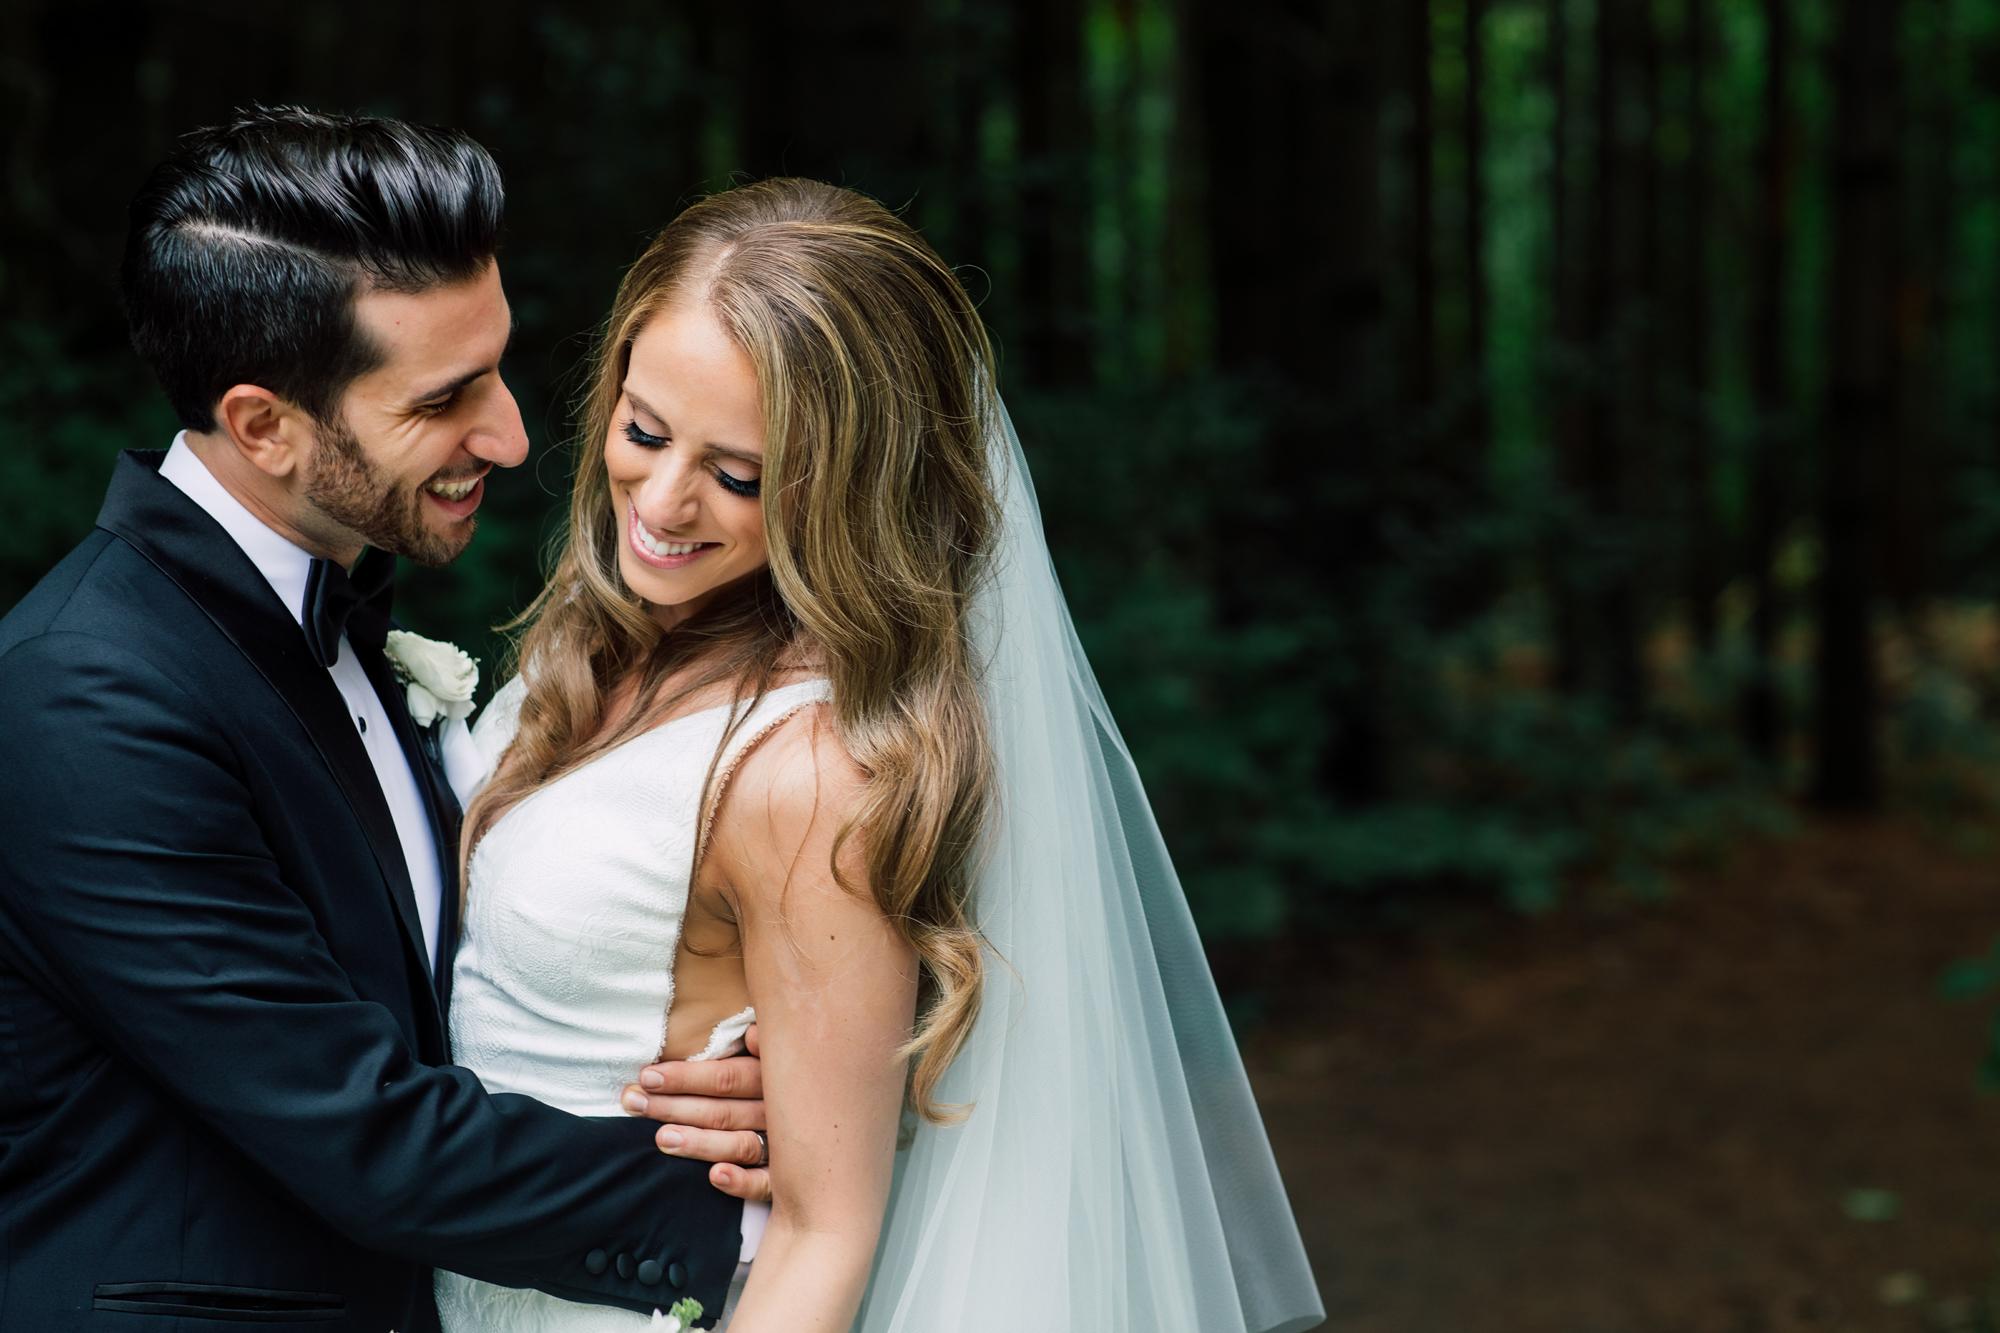 candid wedding bride and groom